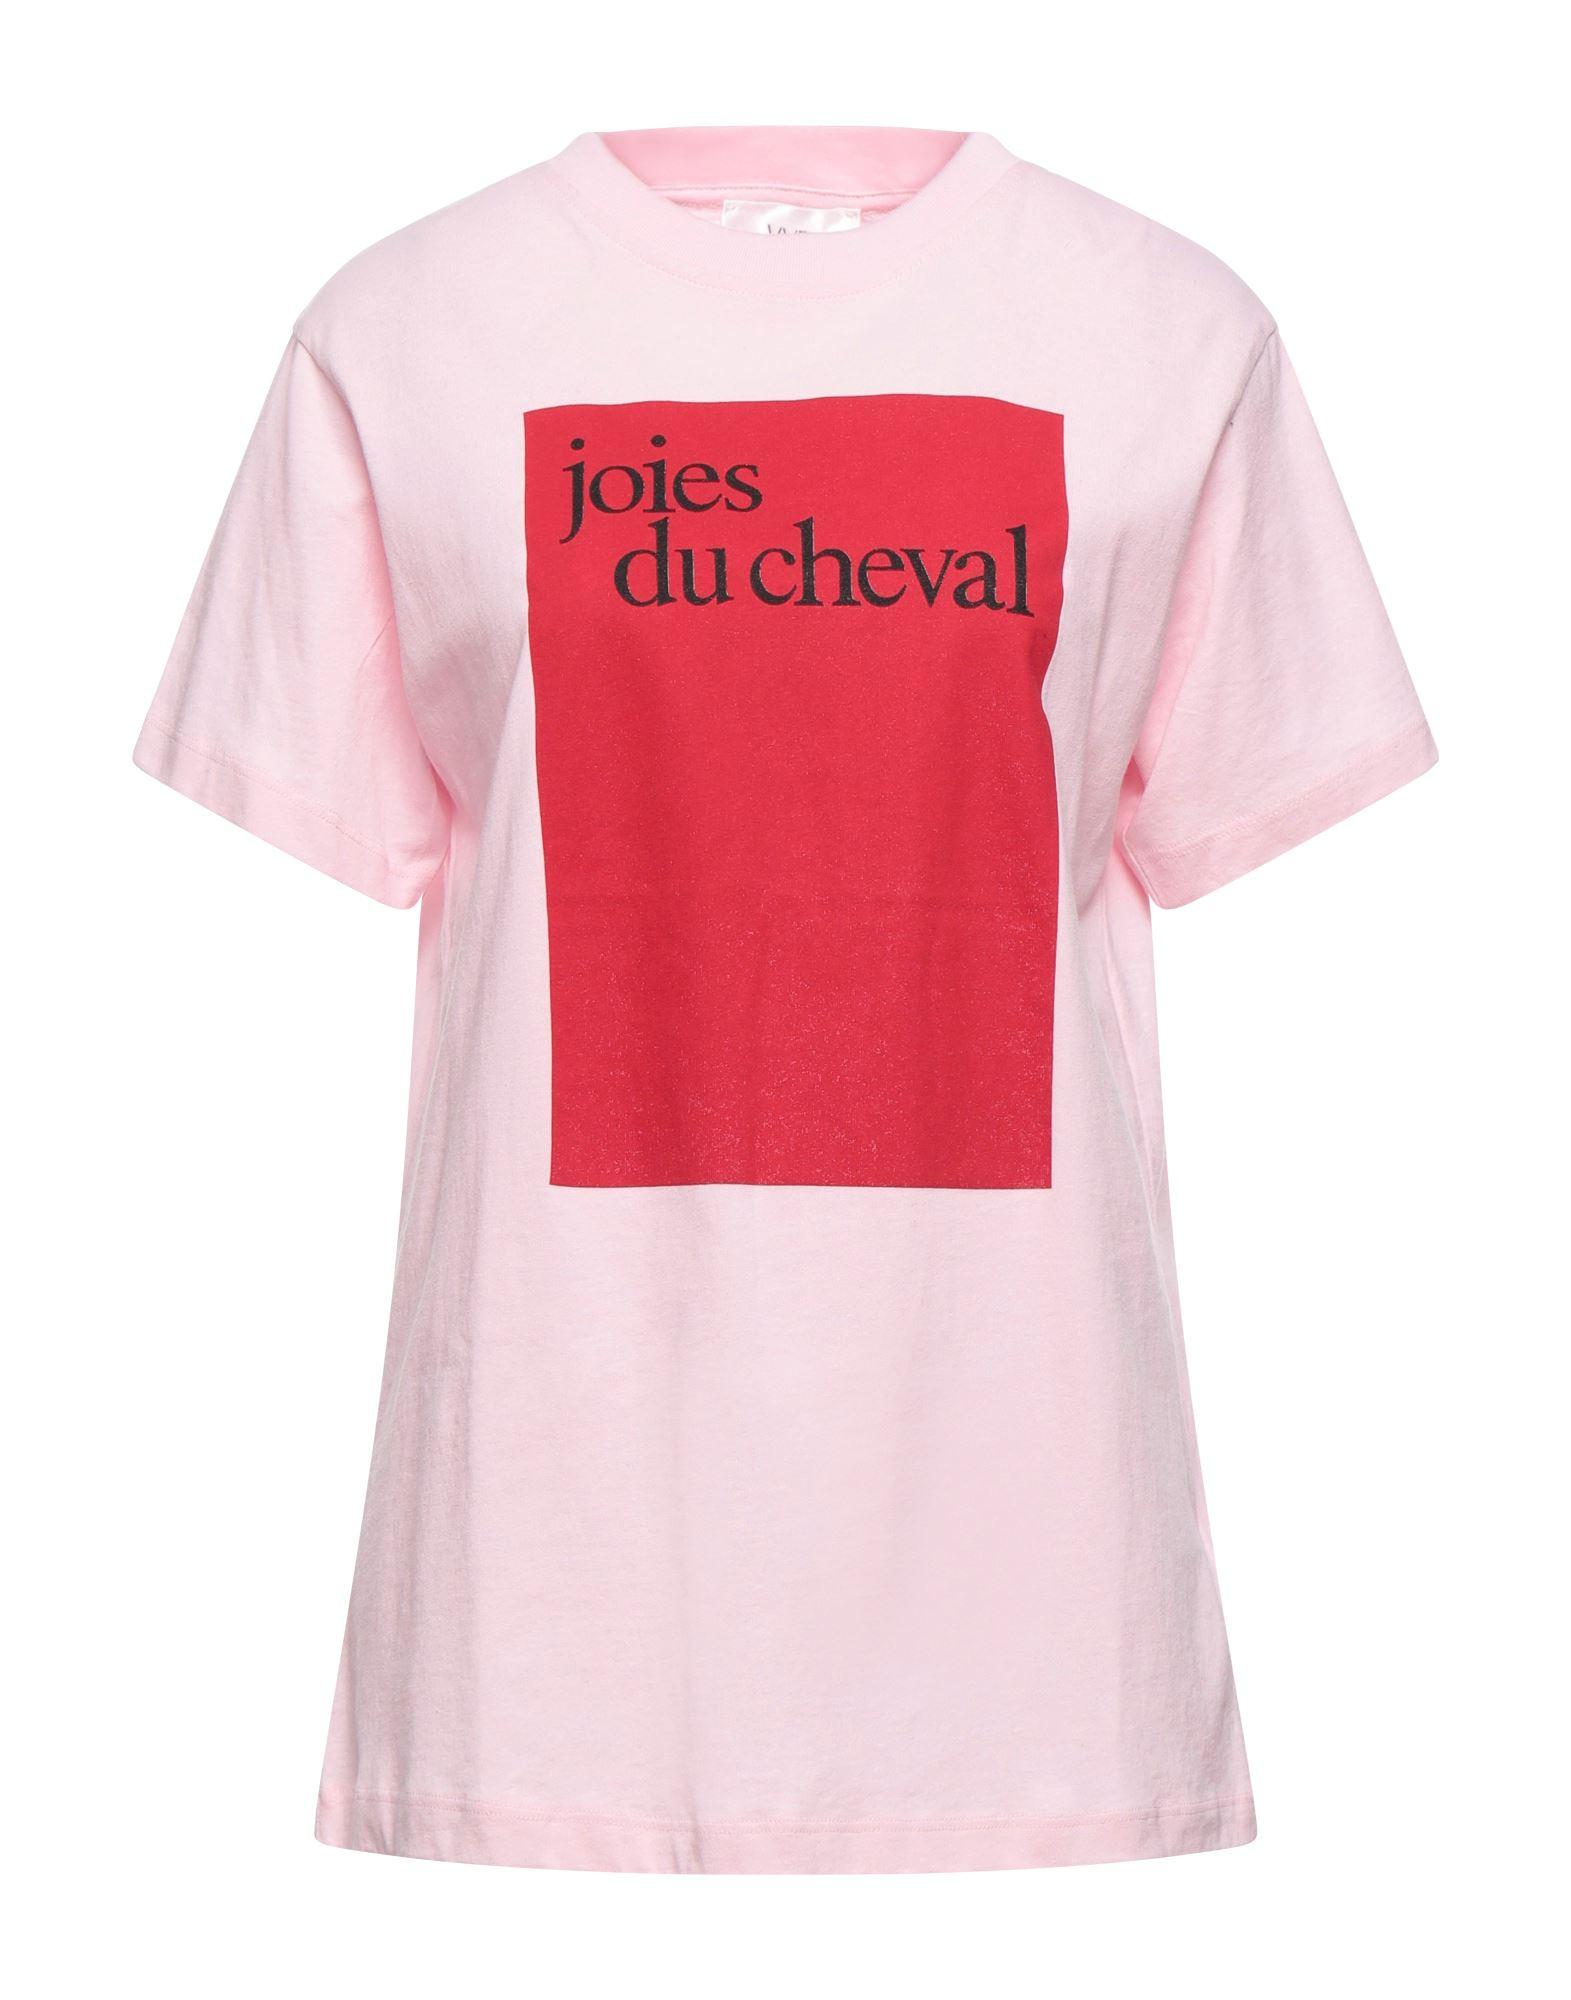 VICTORIA, VICTORIA BECKHAM T-shirts - Item 12564891